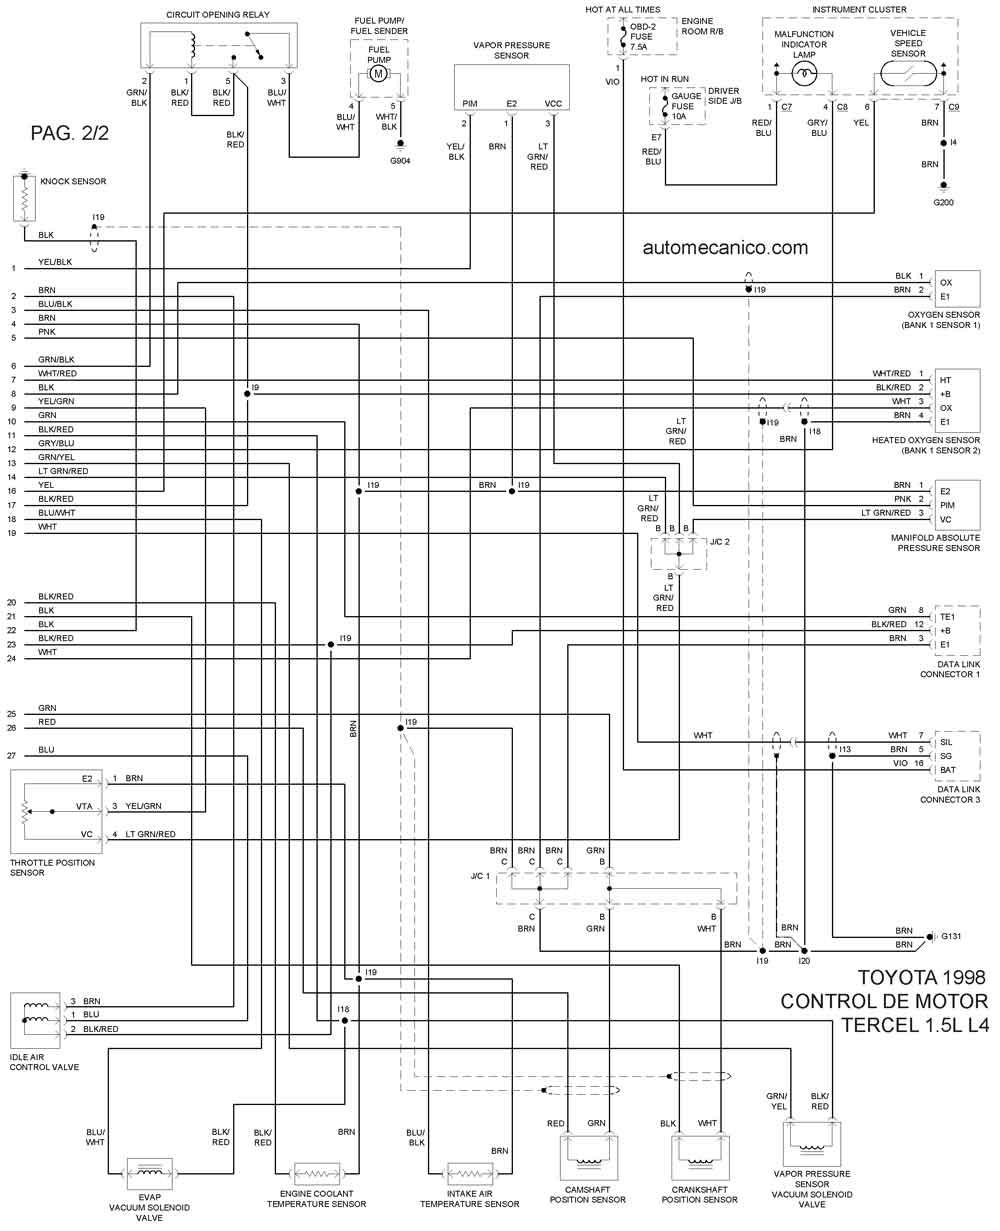 toyota tacoma 3 4l engine